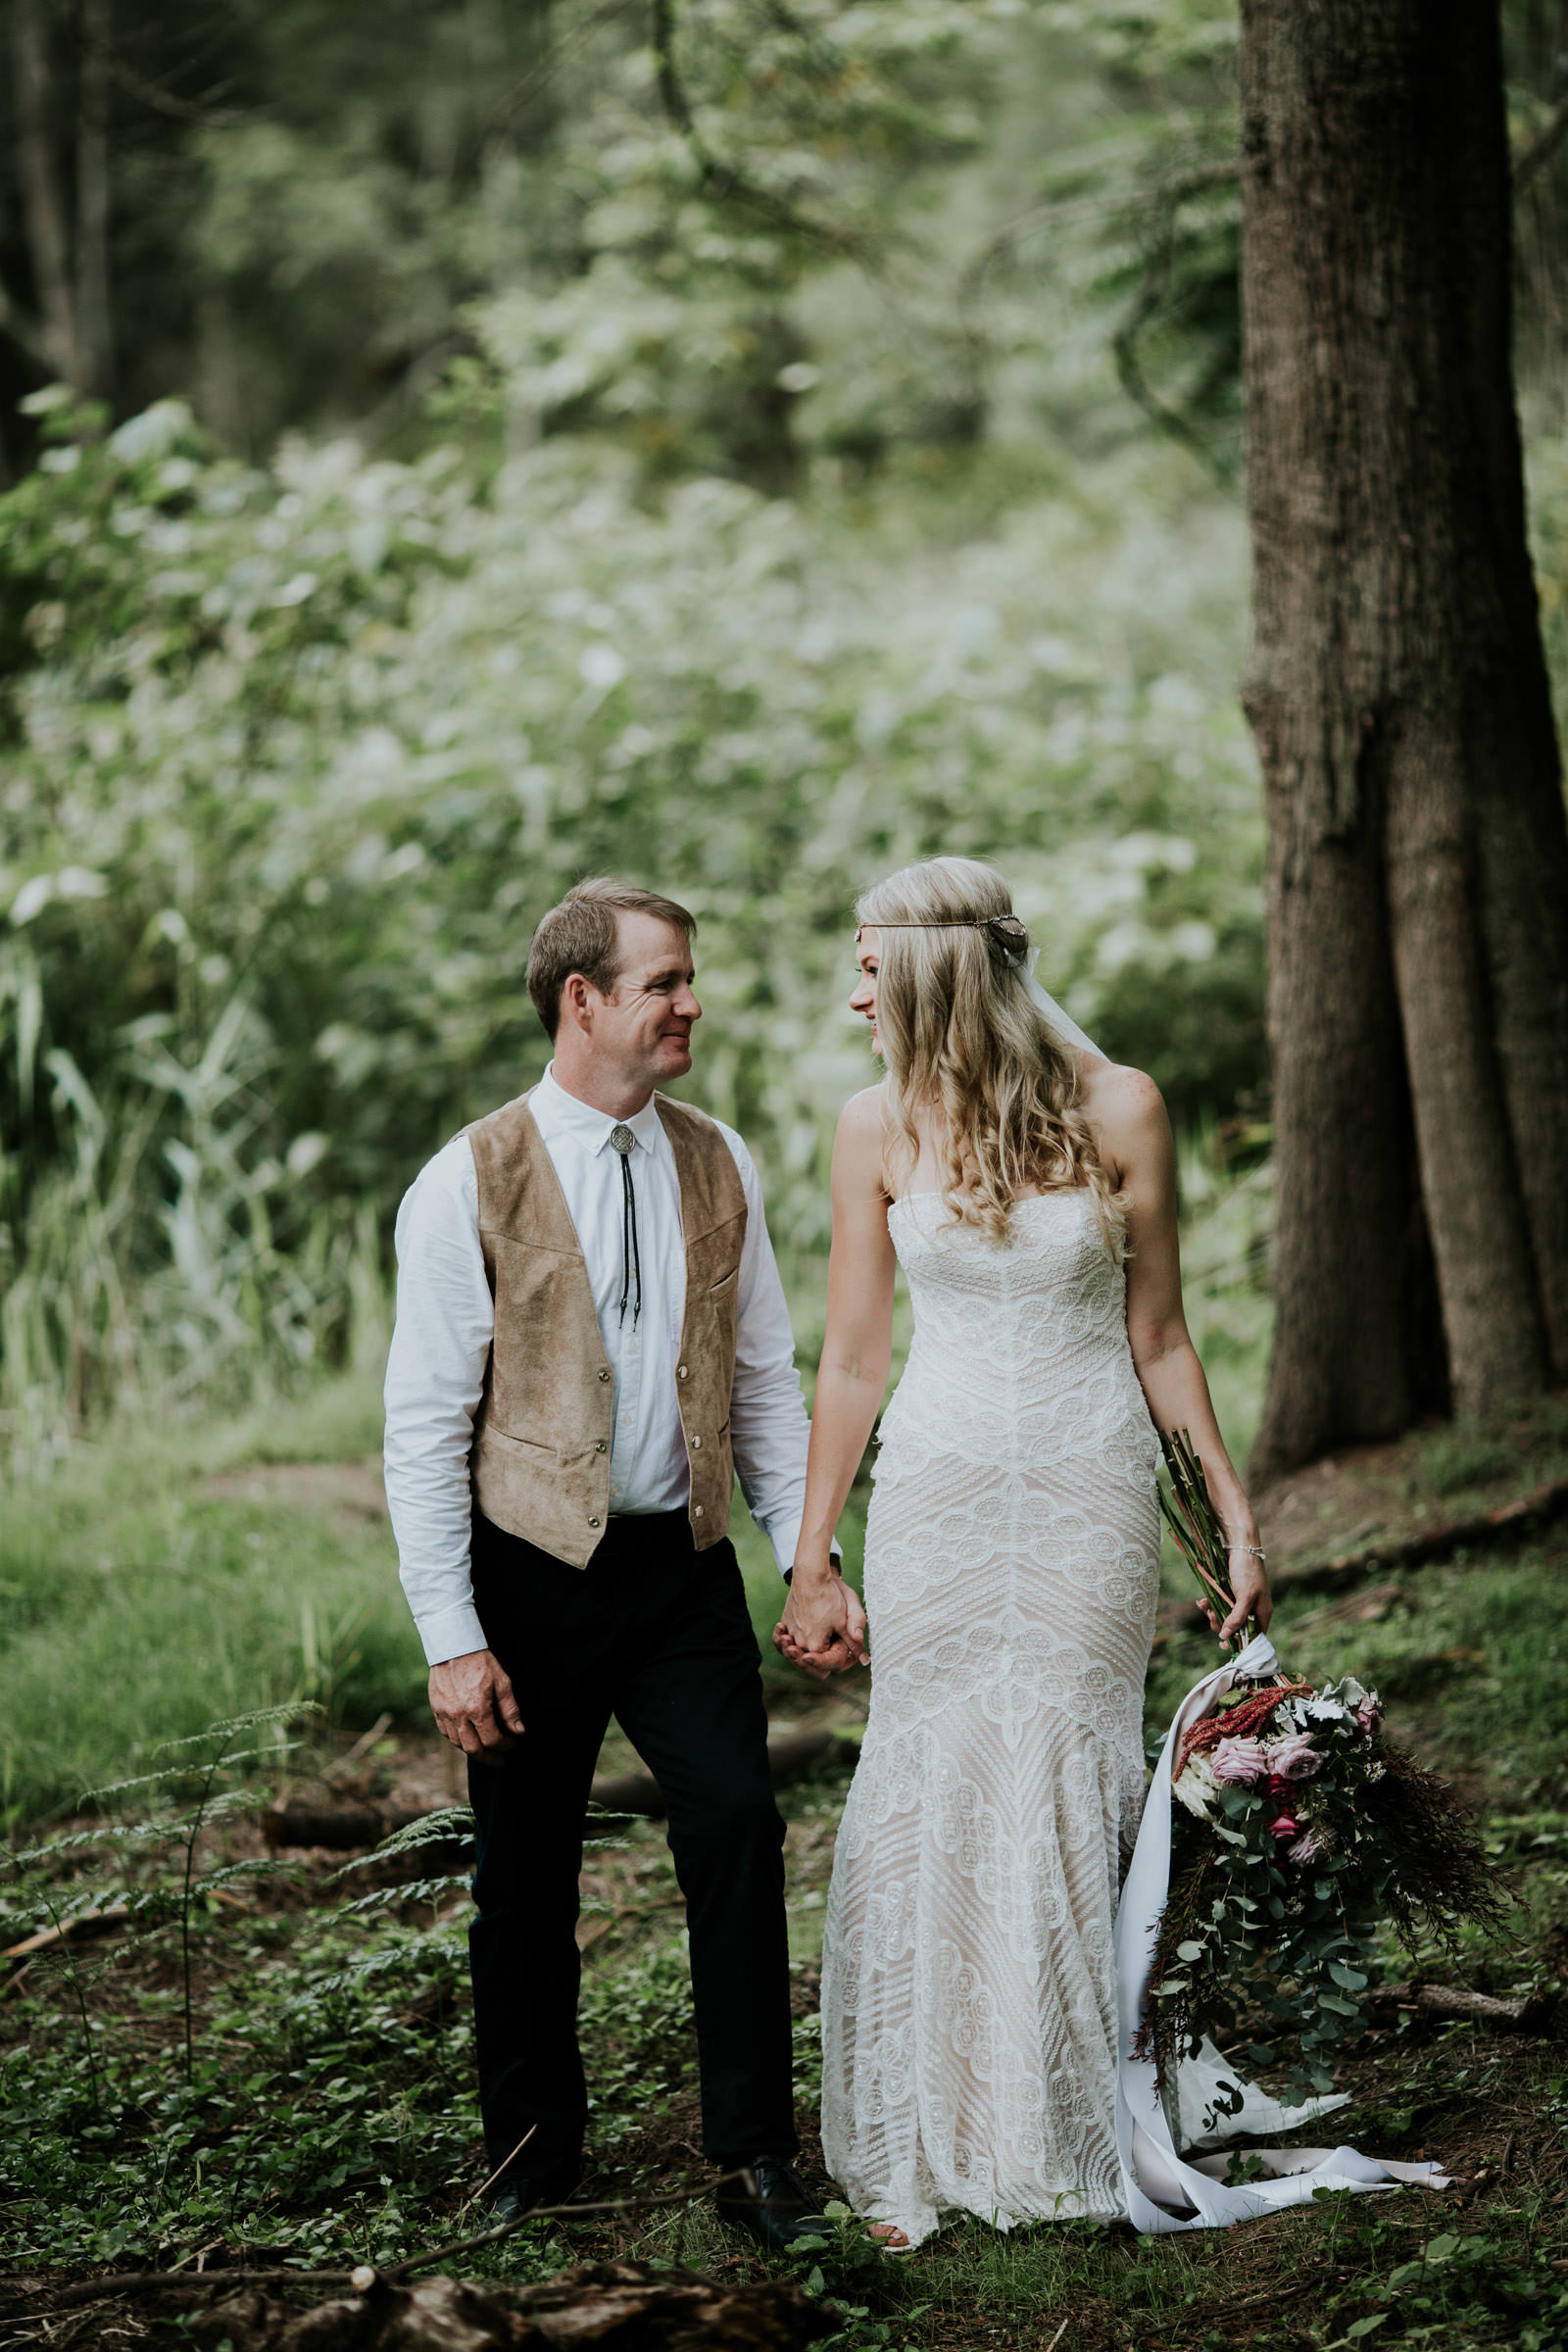 Emma+John+Far+South+Coast+Wedding+Festivl+Glamping+Bush-120.jpg